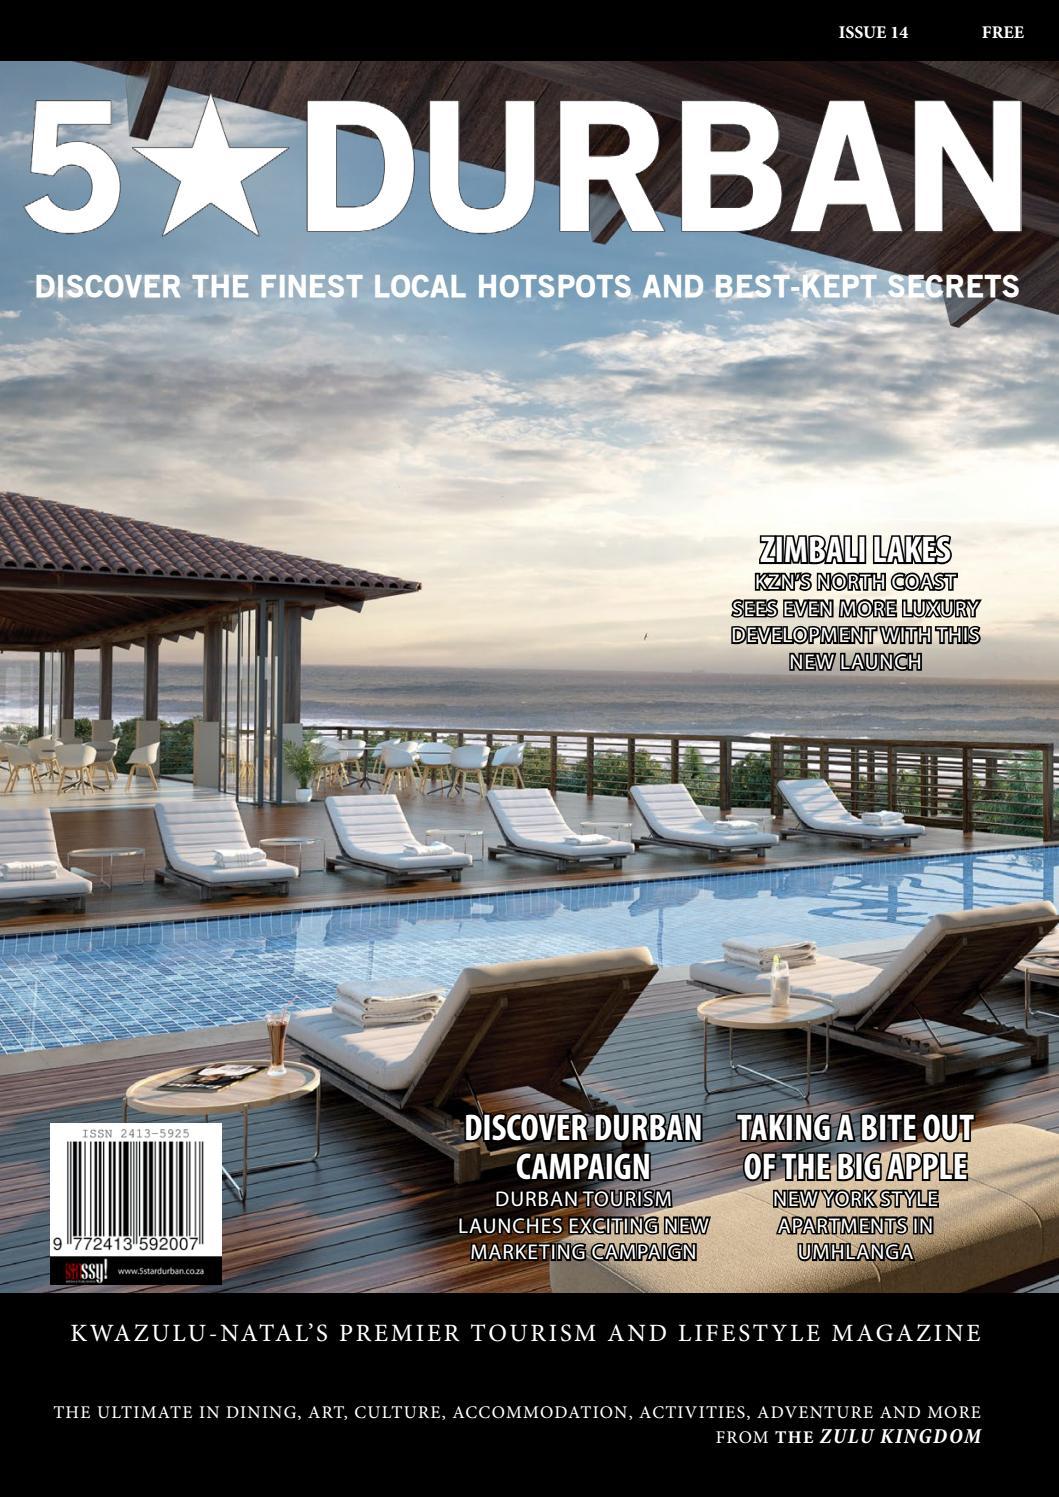 5 Star Durban Issue 14 by